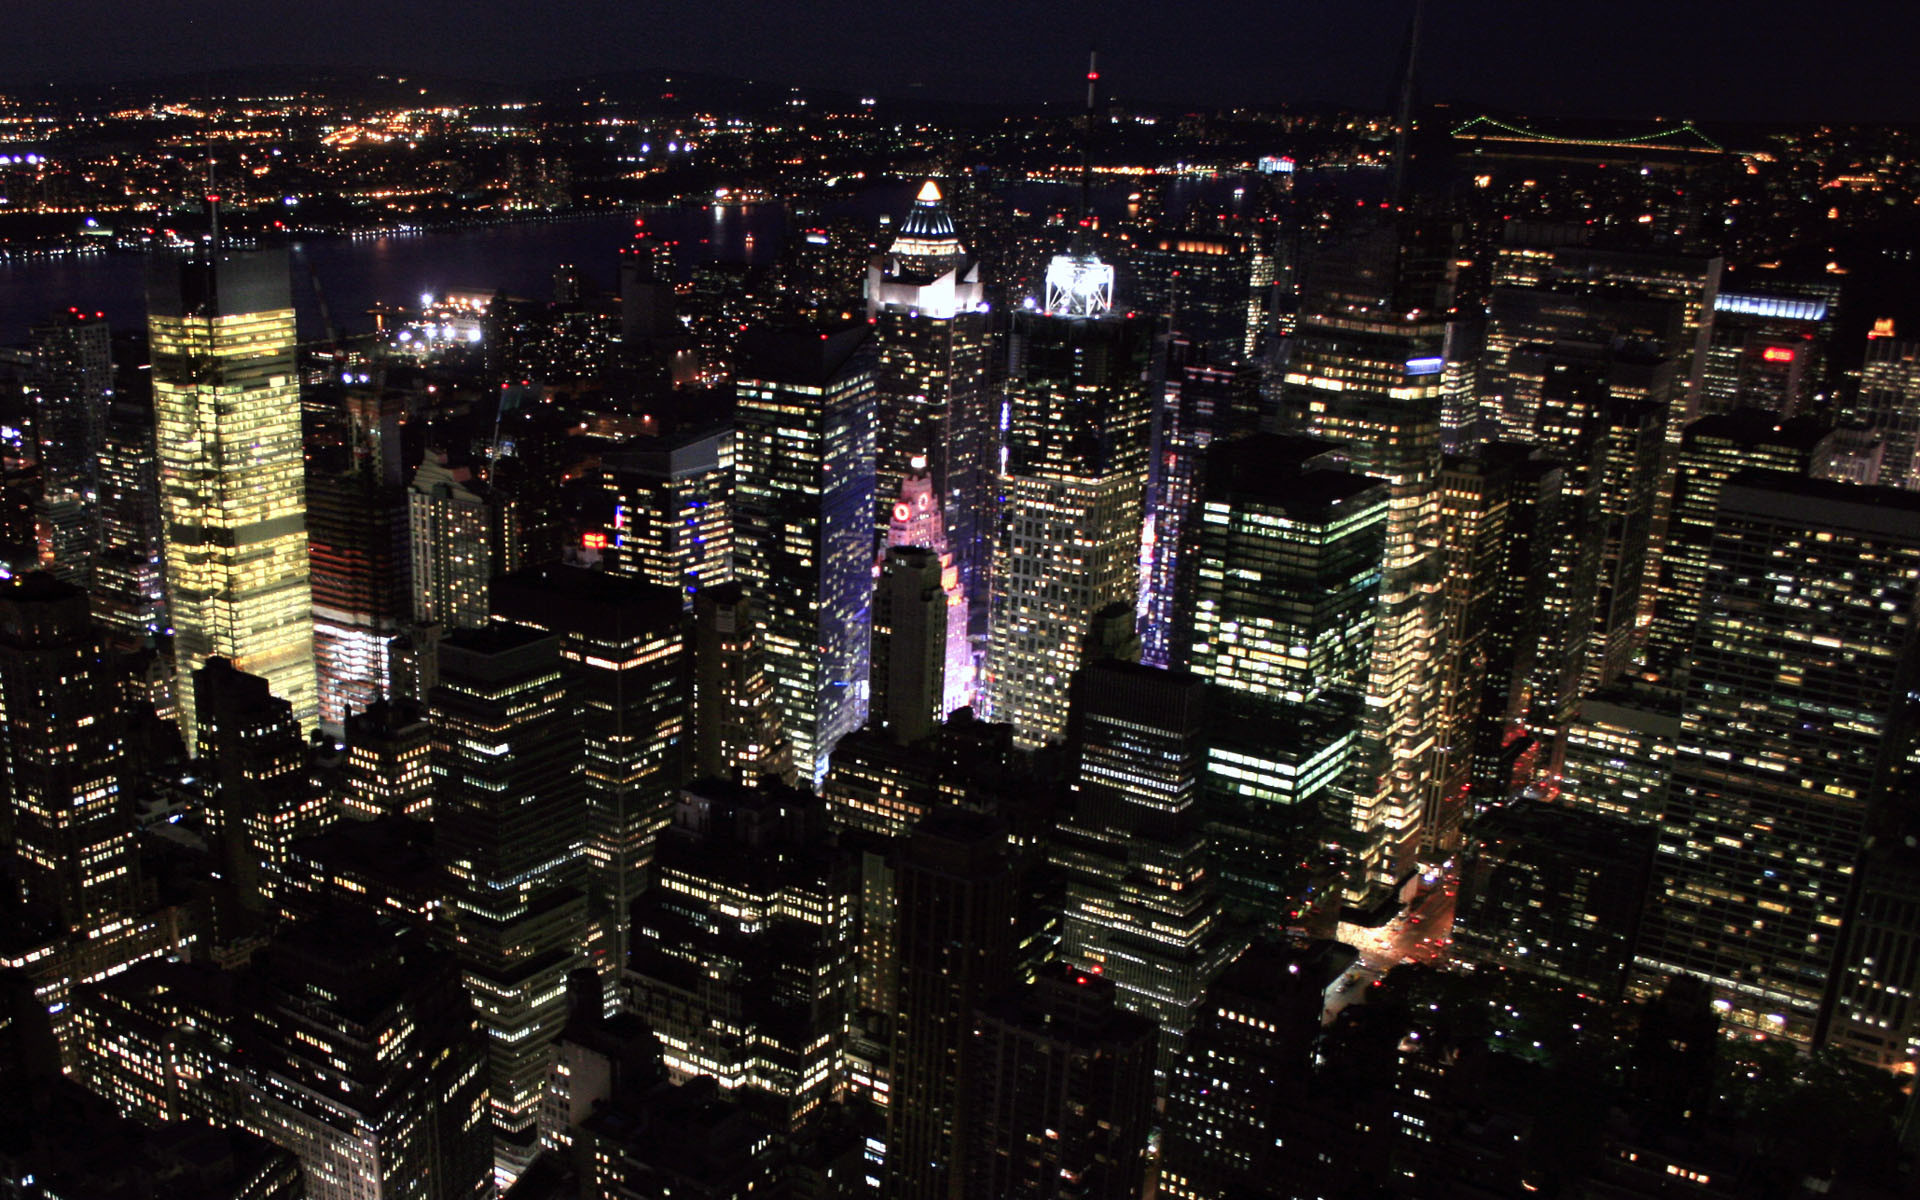 New York City At Night Wallpaper